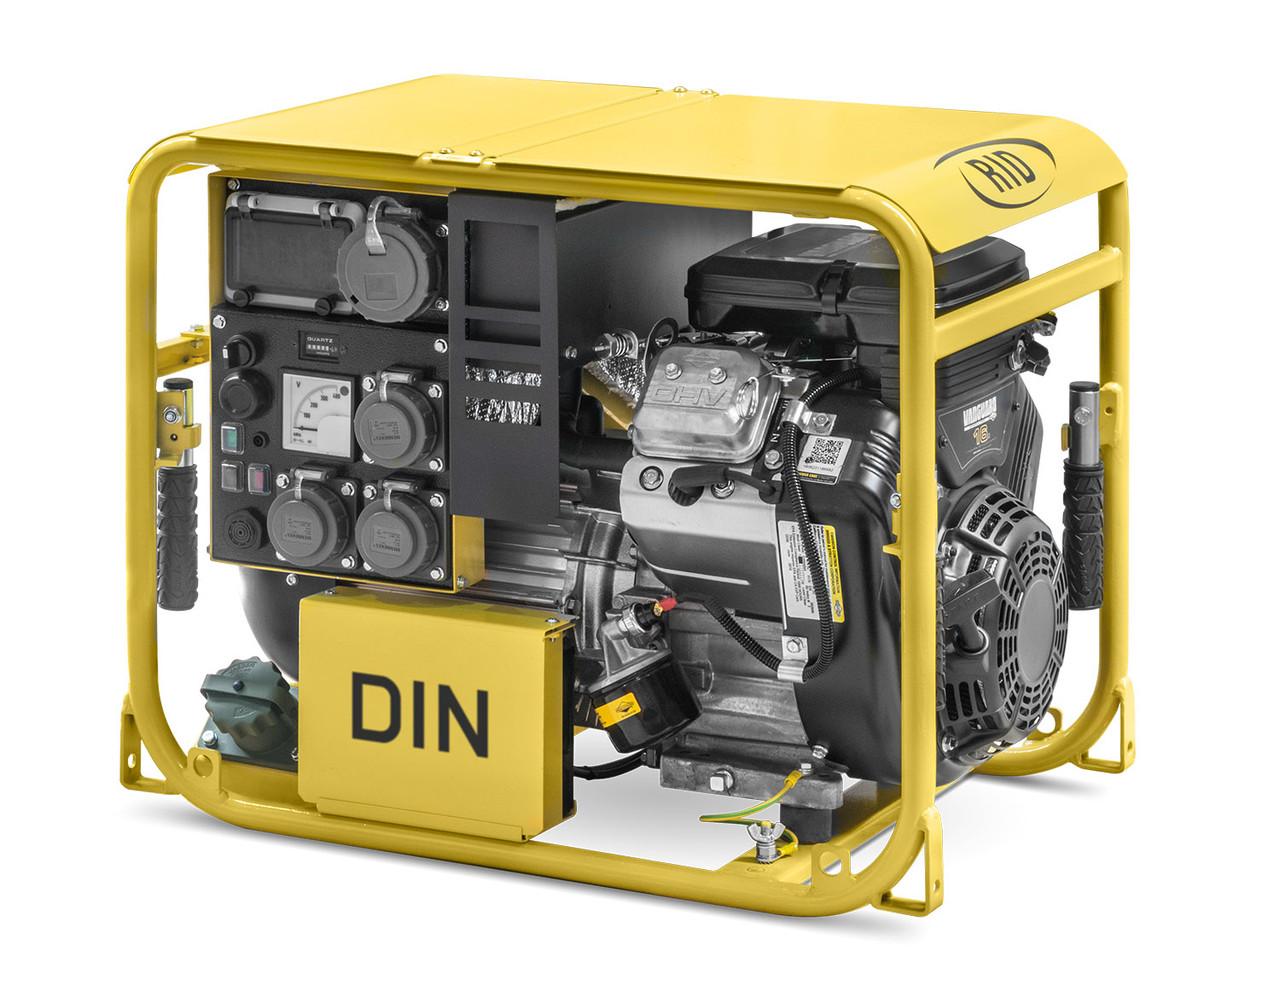 DIN генератор RV 13540 ERN (10,4 кВт)